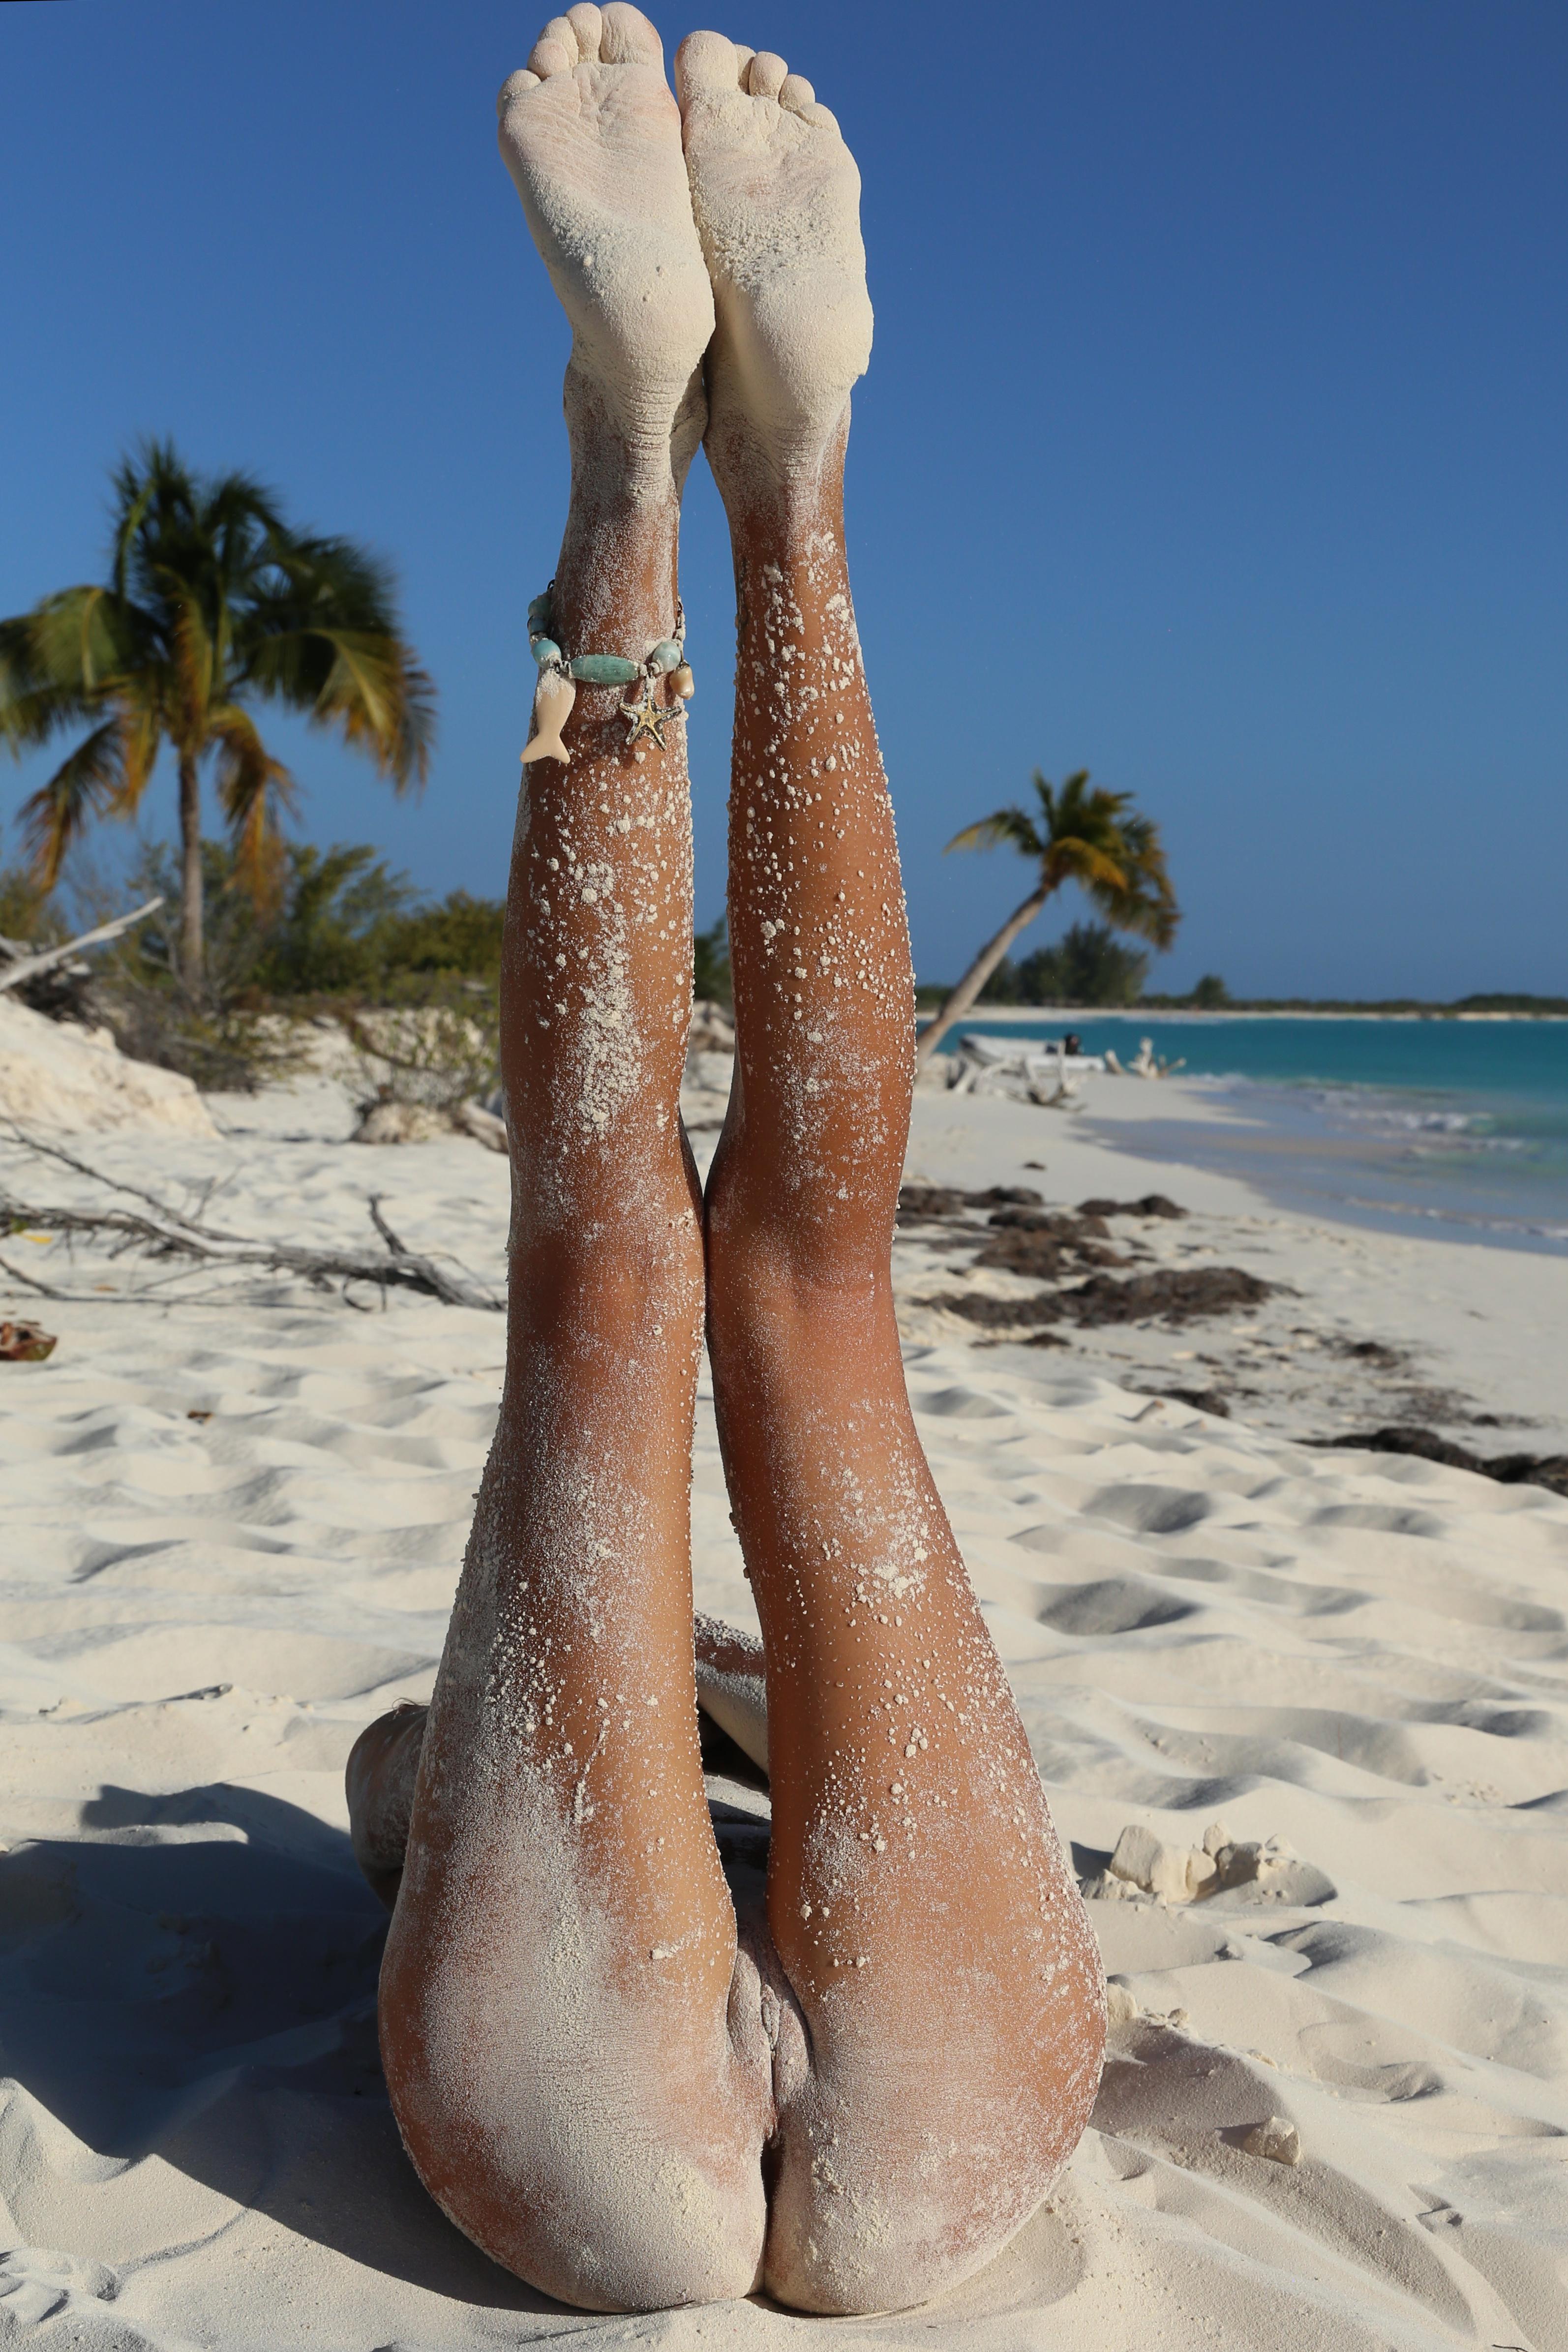 palm-beach-pussy-nude-big-blonde